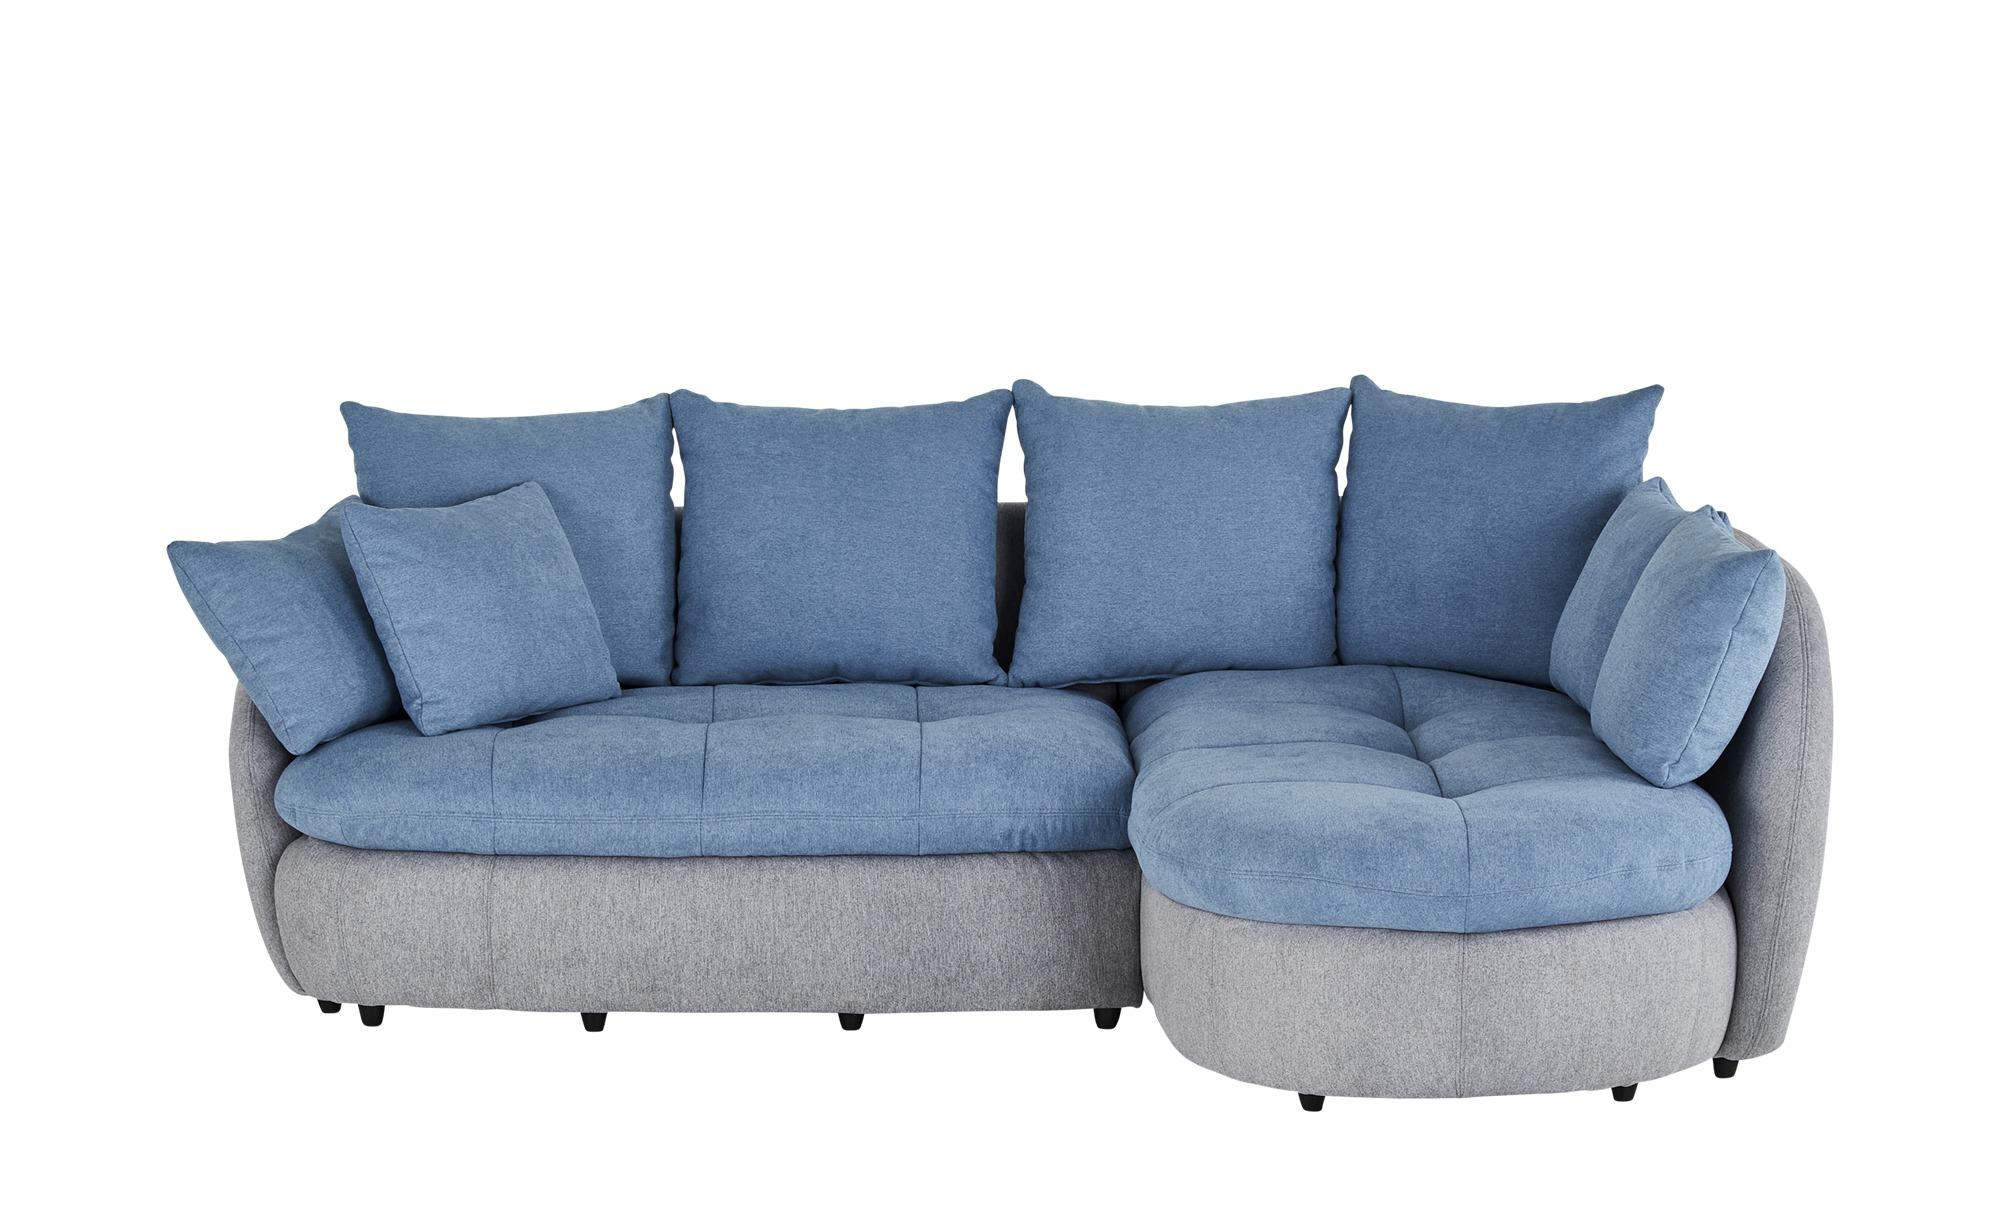 uno Ecksofa  Leslie ¦ blau Polstermöbel > Sofas > Ecksofas - Höffner